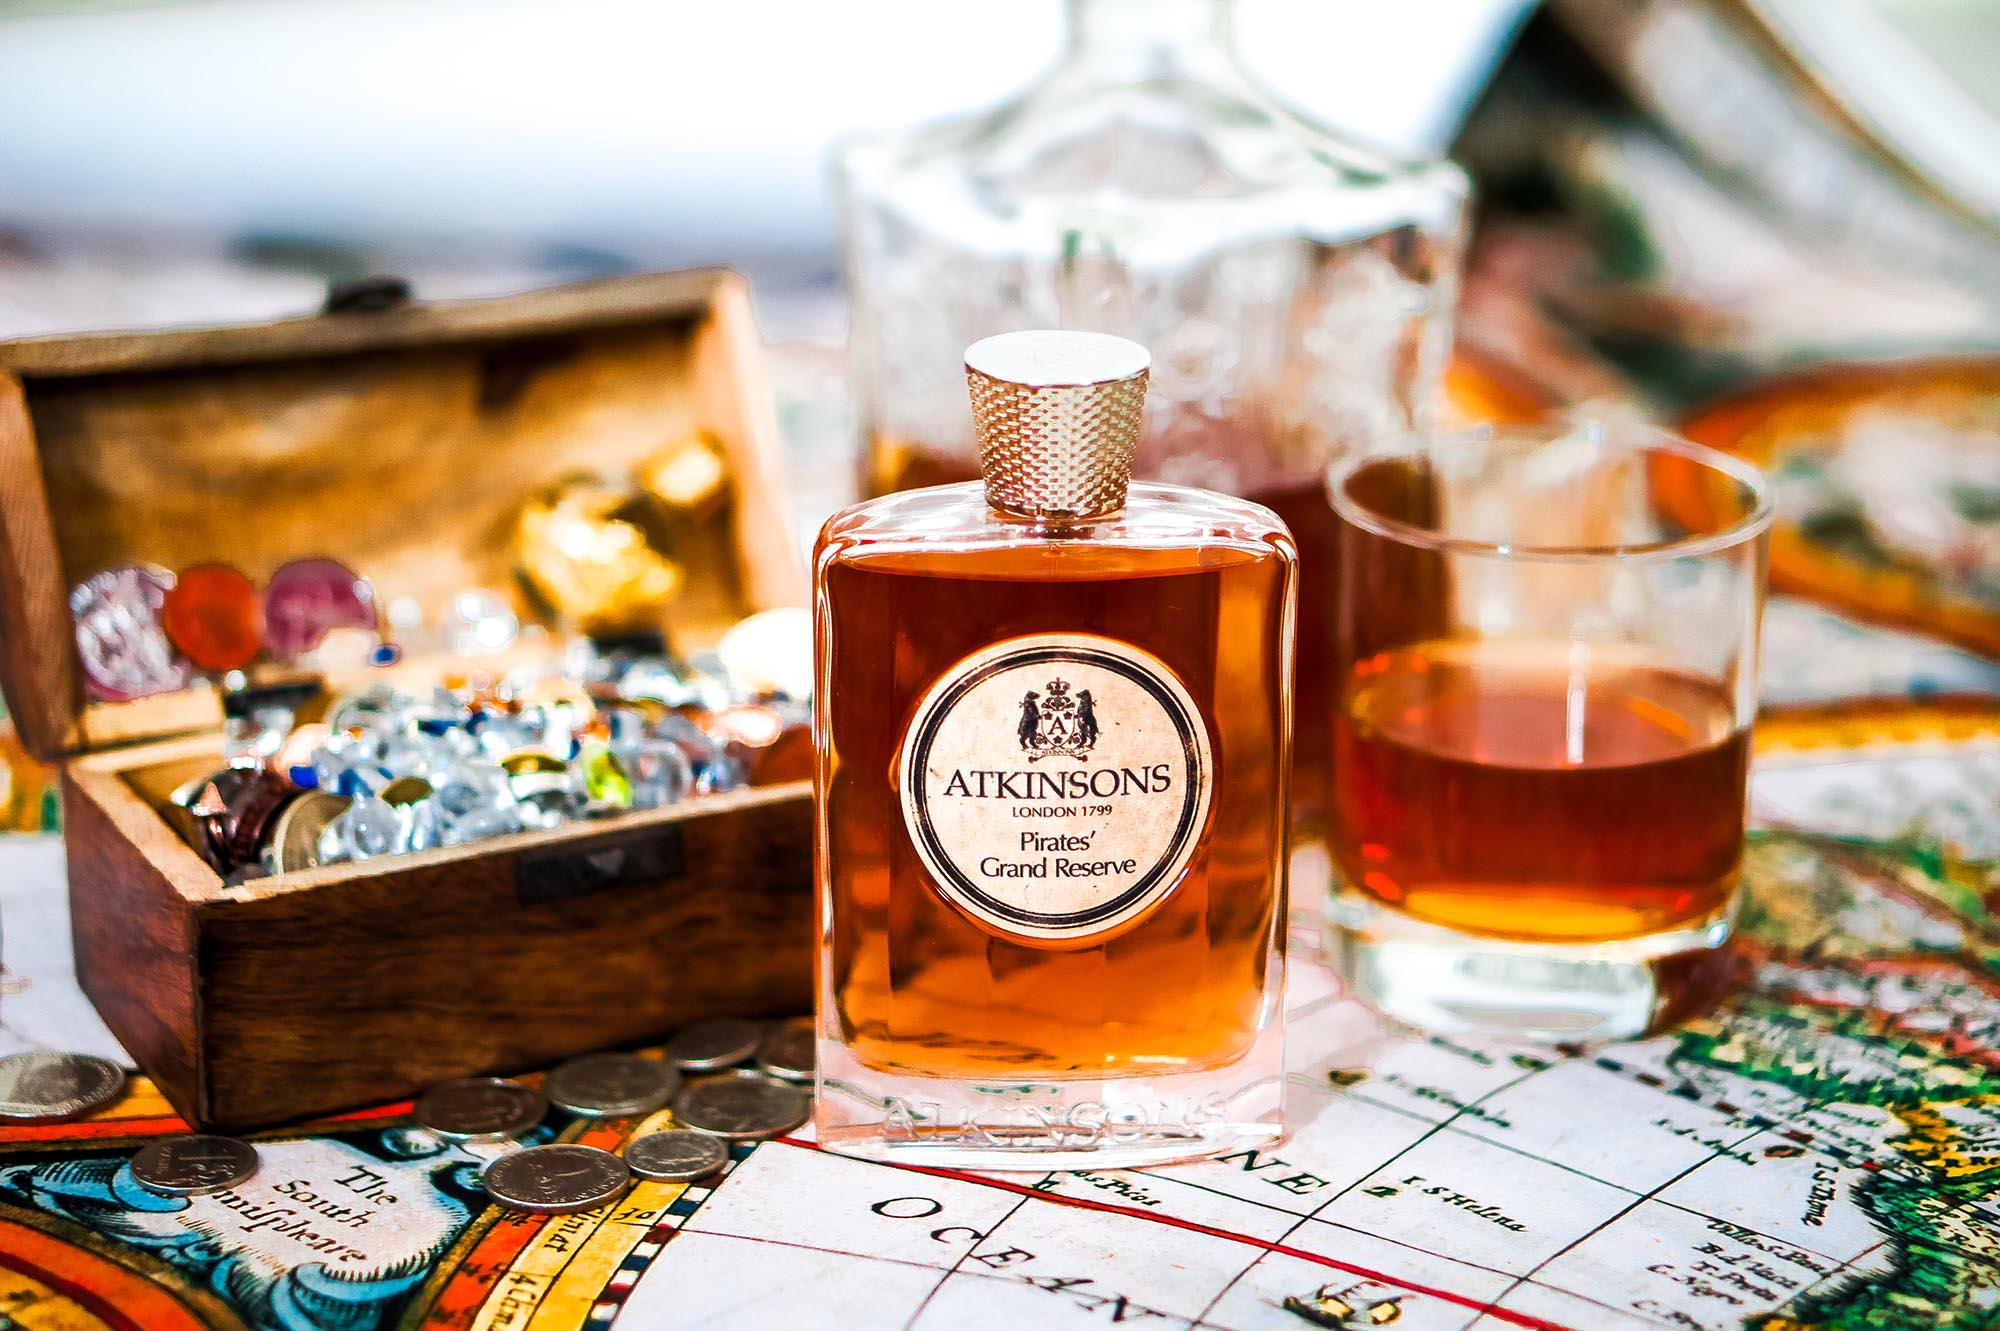 A Jolly Good Perfume: Atkinsons Pirates' Grand Reserve